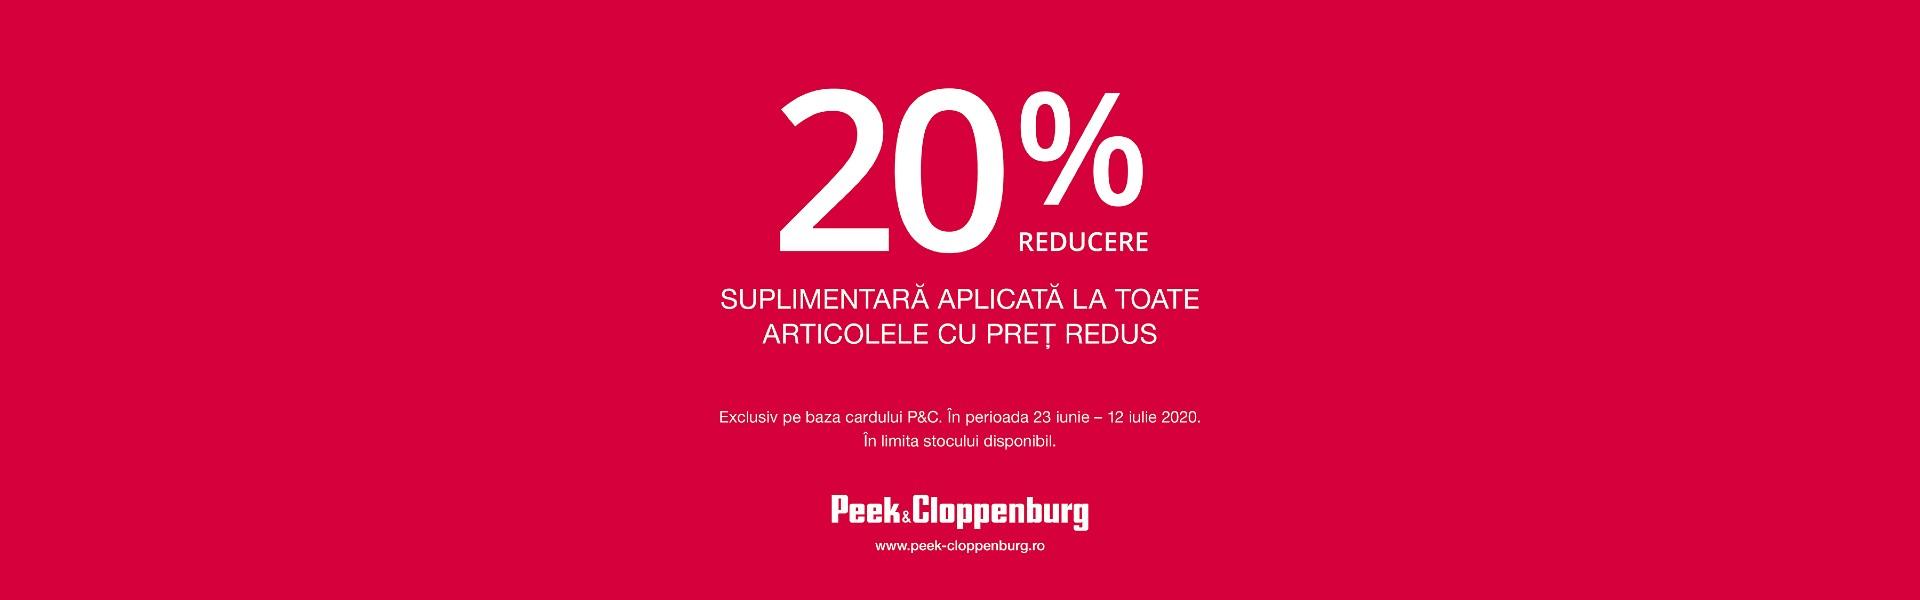 Peek Cloppenburg 20%